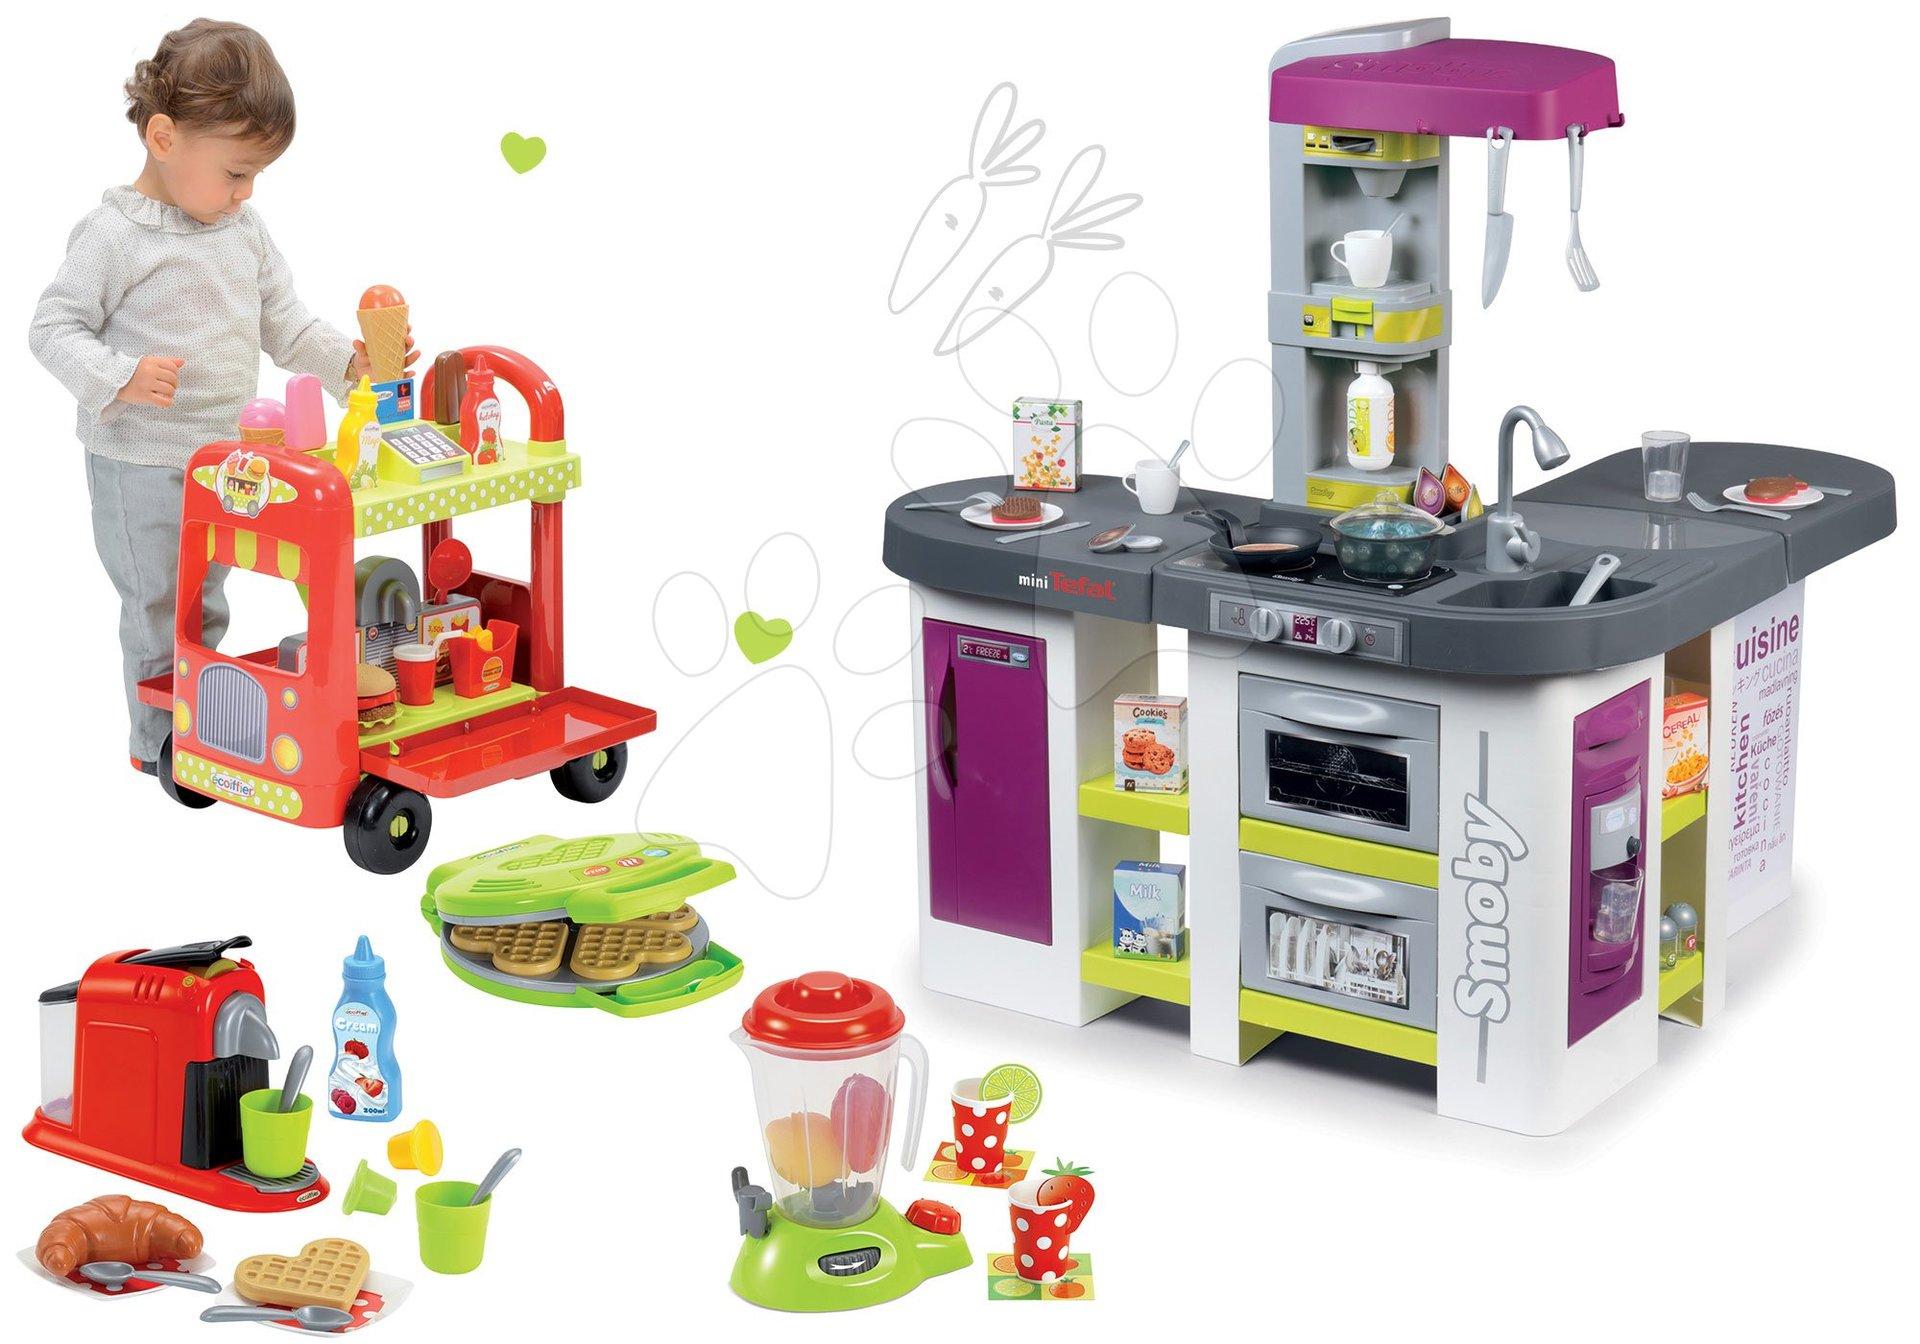 Smoby set kuchynka elektronická Tefal Studio XXL Bubble a vozík so zmrzlinou a hamburgermi a vaflovač s doplnkami 311033-10